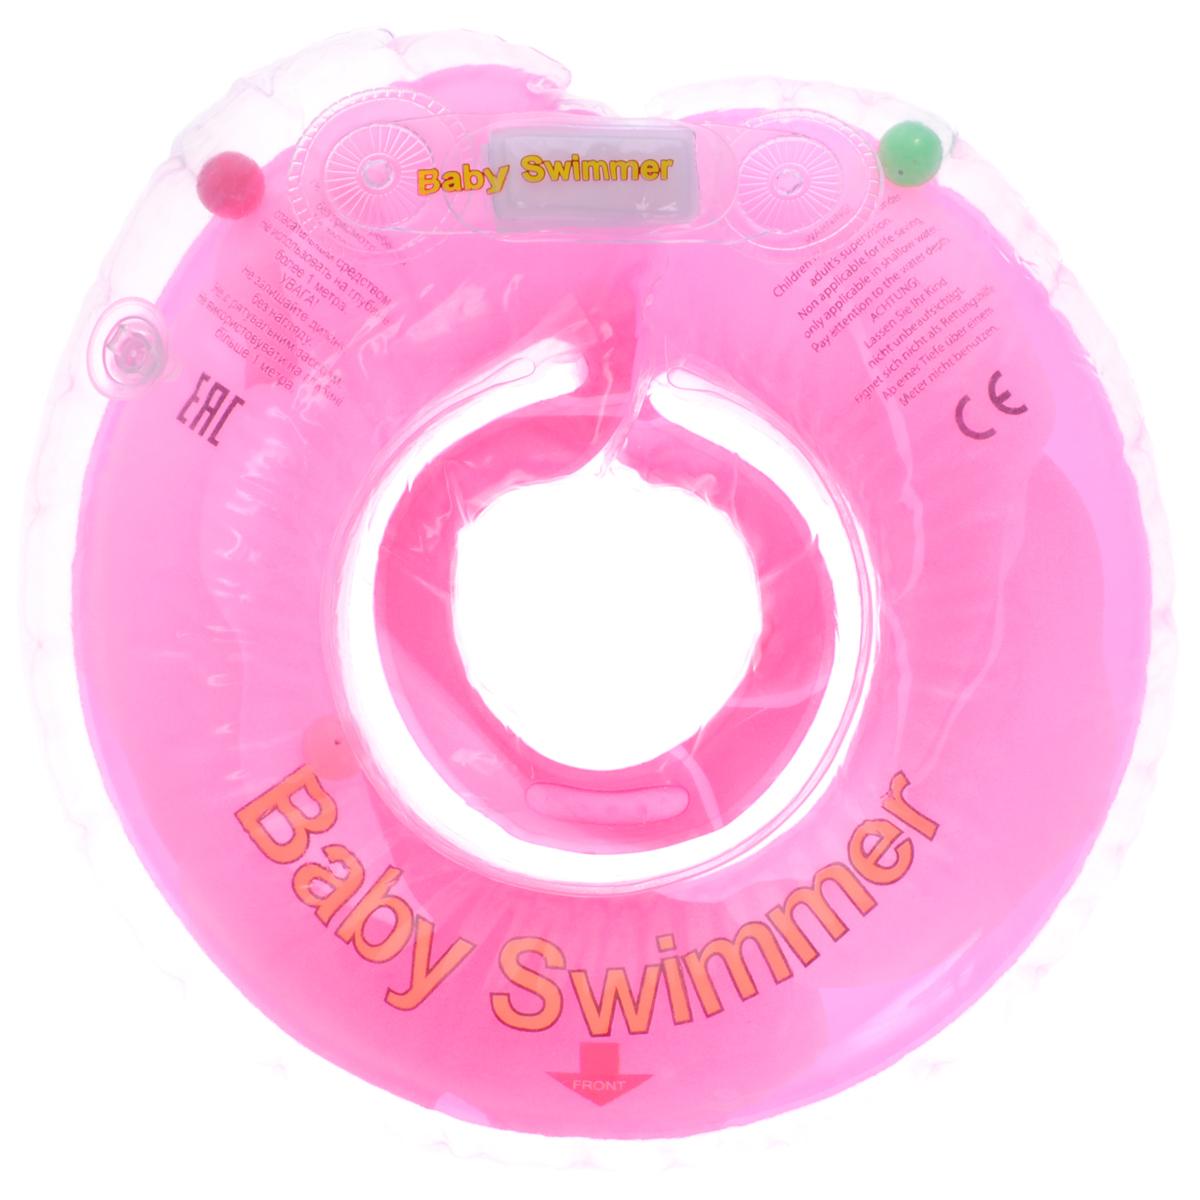 Baby Swimmer Круг на шею Розовый бутон с погремушкой 6-36 кг -  Круги для купания